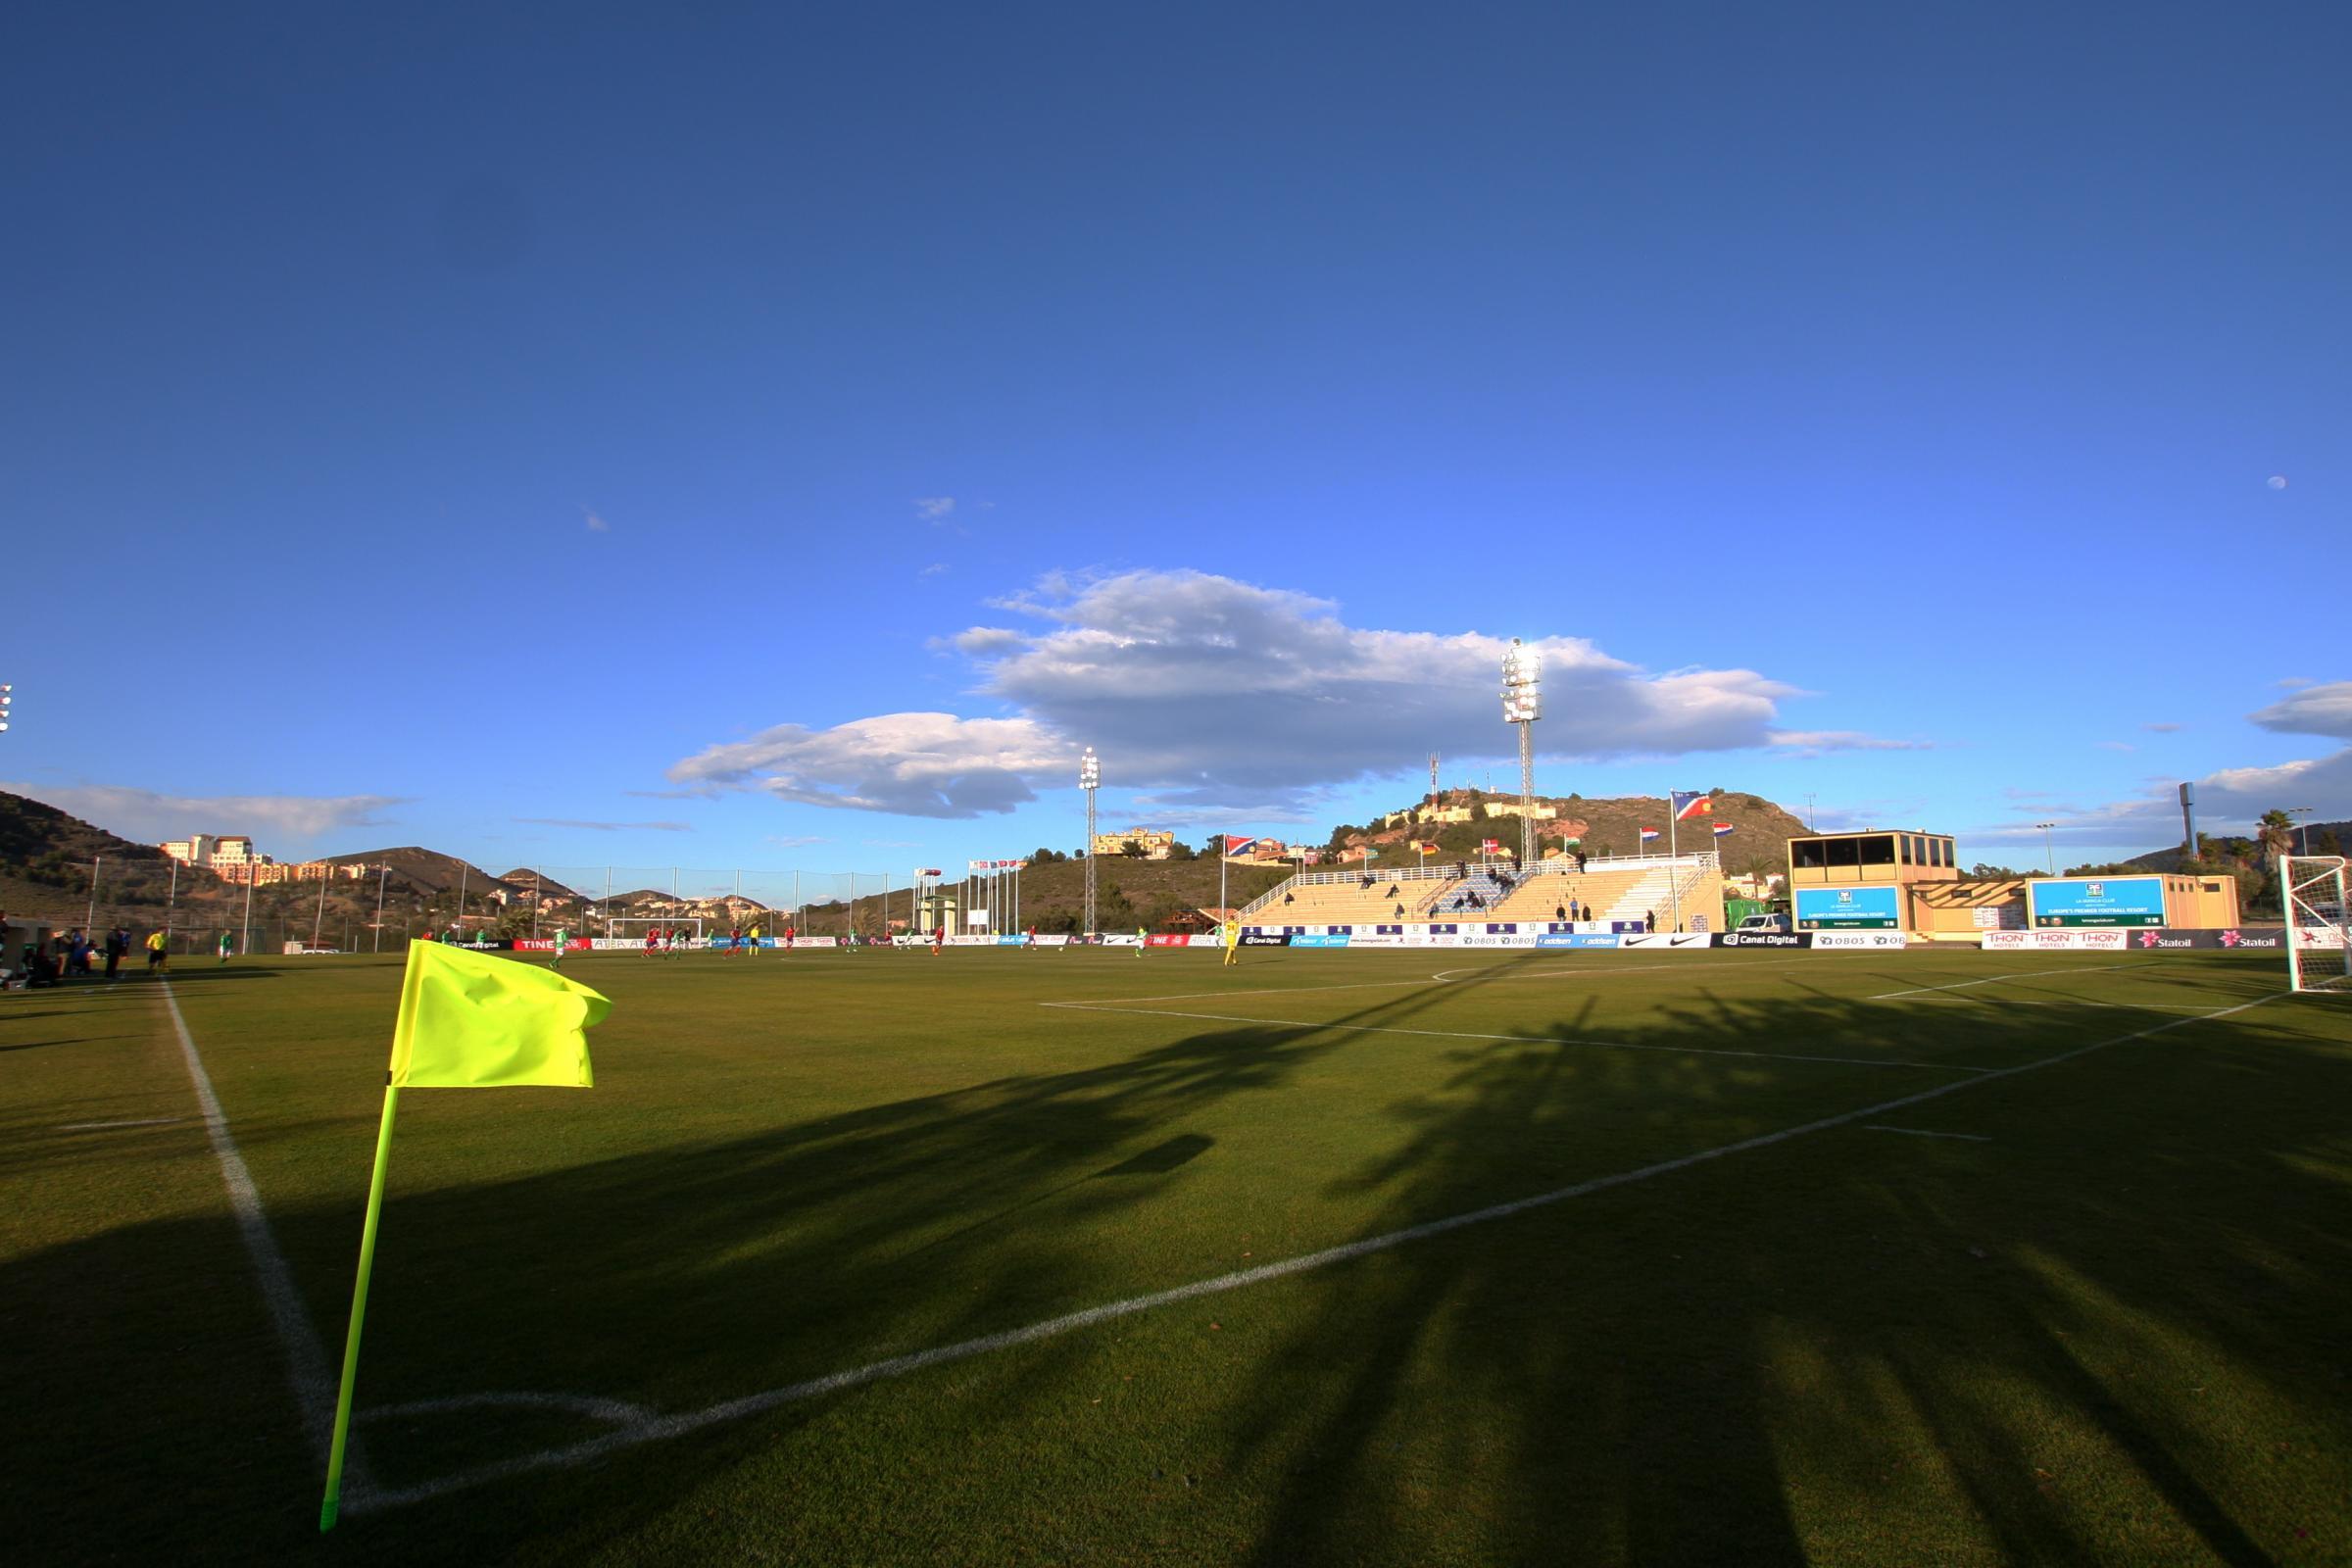 Eddie Howe excited to take AFC Bournemouth back to La Manga